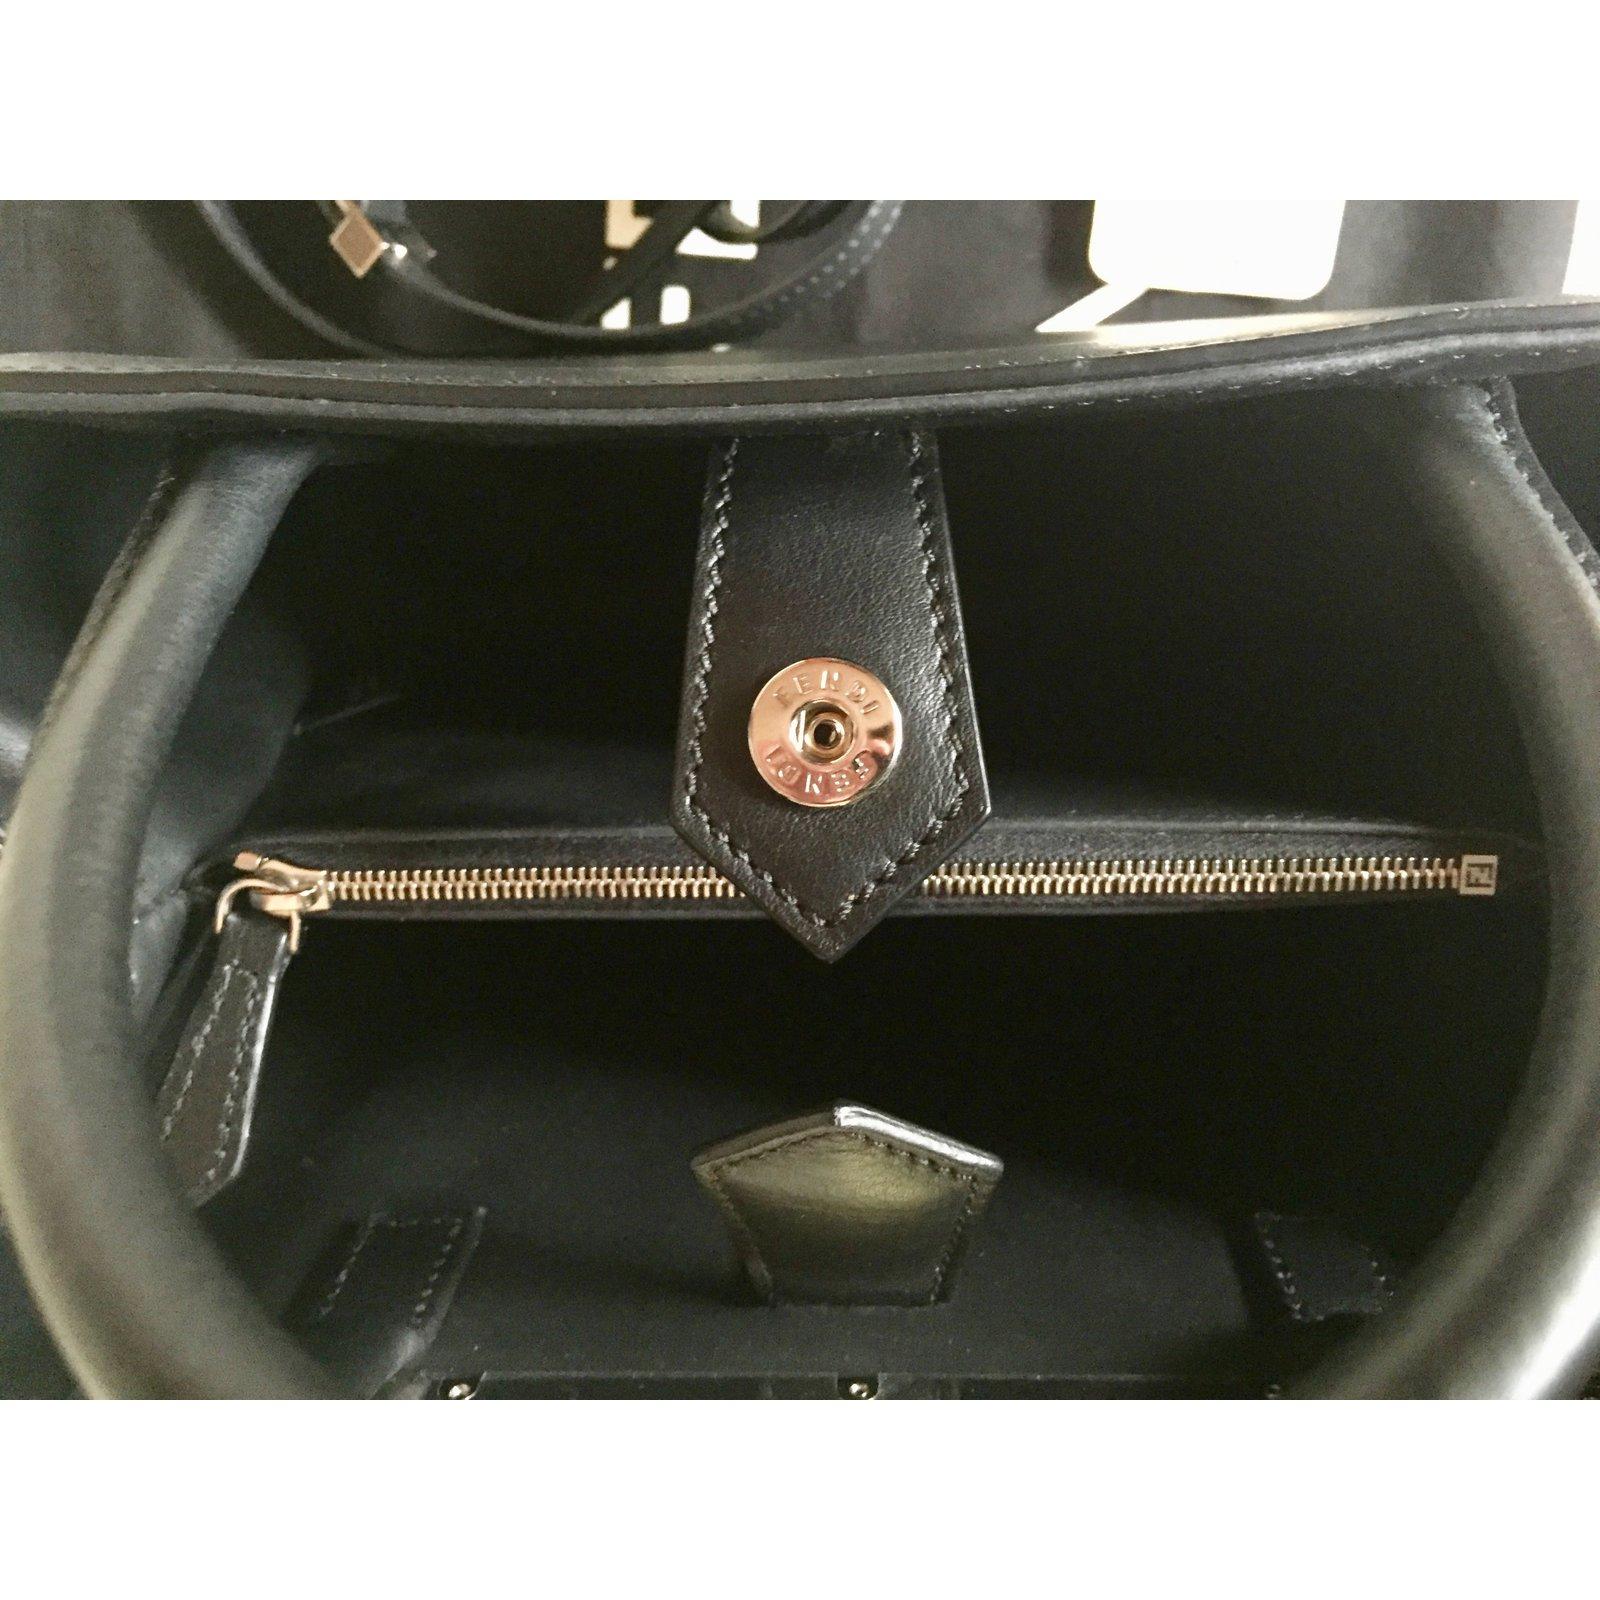 Facebook · Pin This. Fendi Fendi Petite 2jours Handbags Leather Black ref. 67920 bb3740b5f98fb